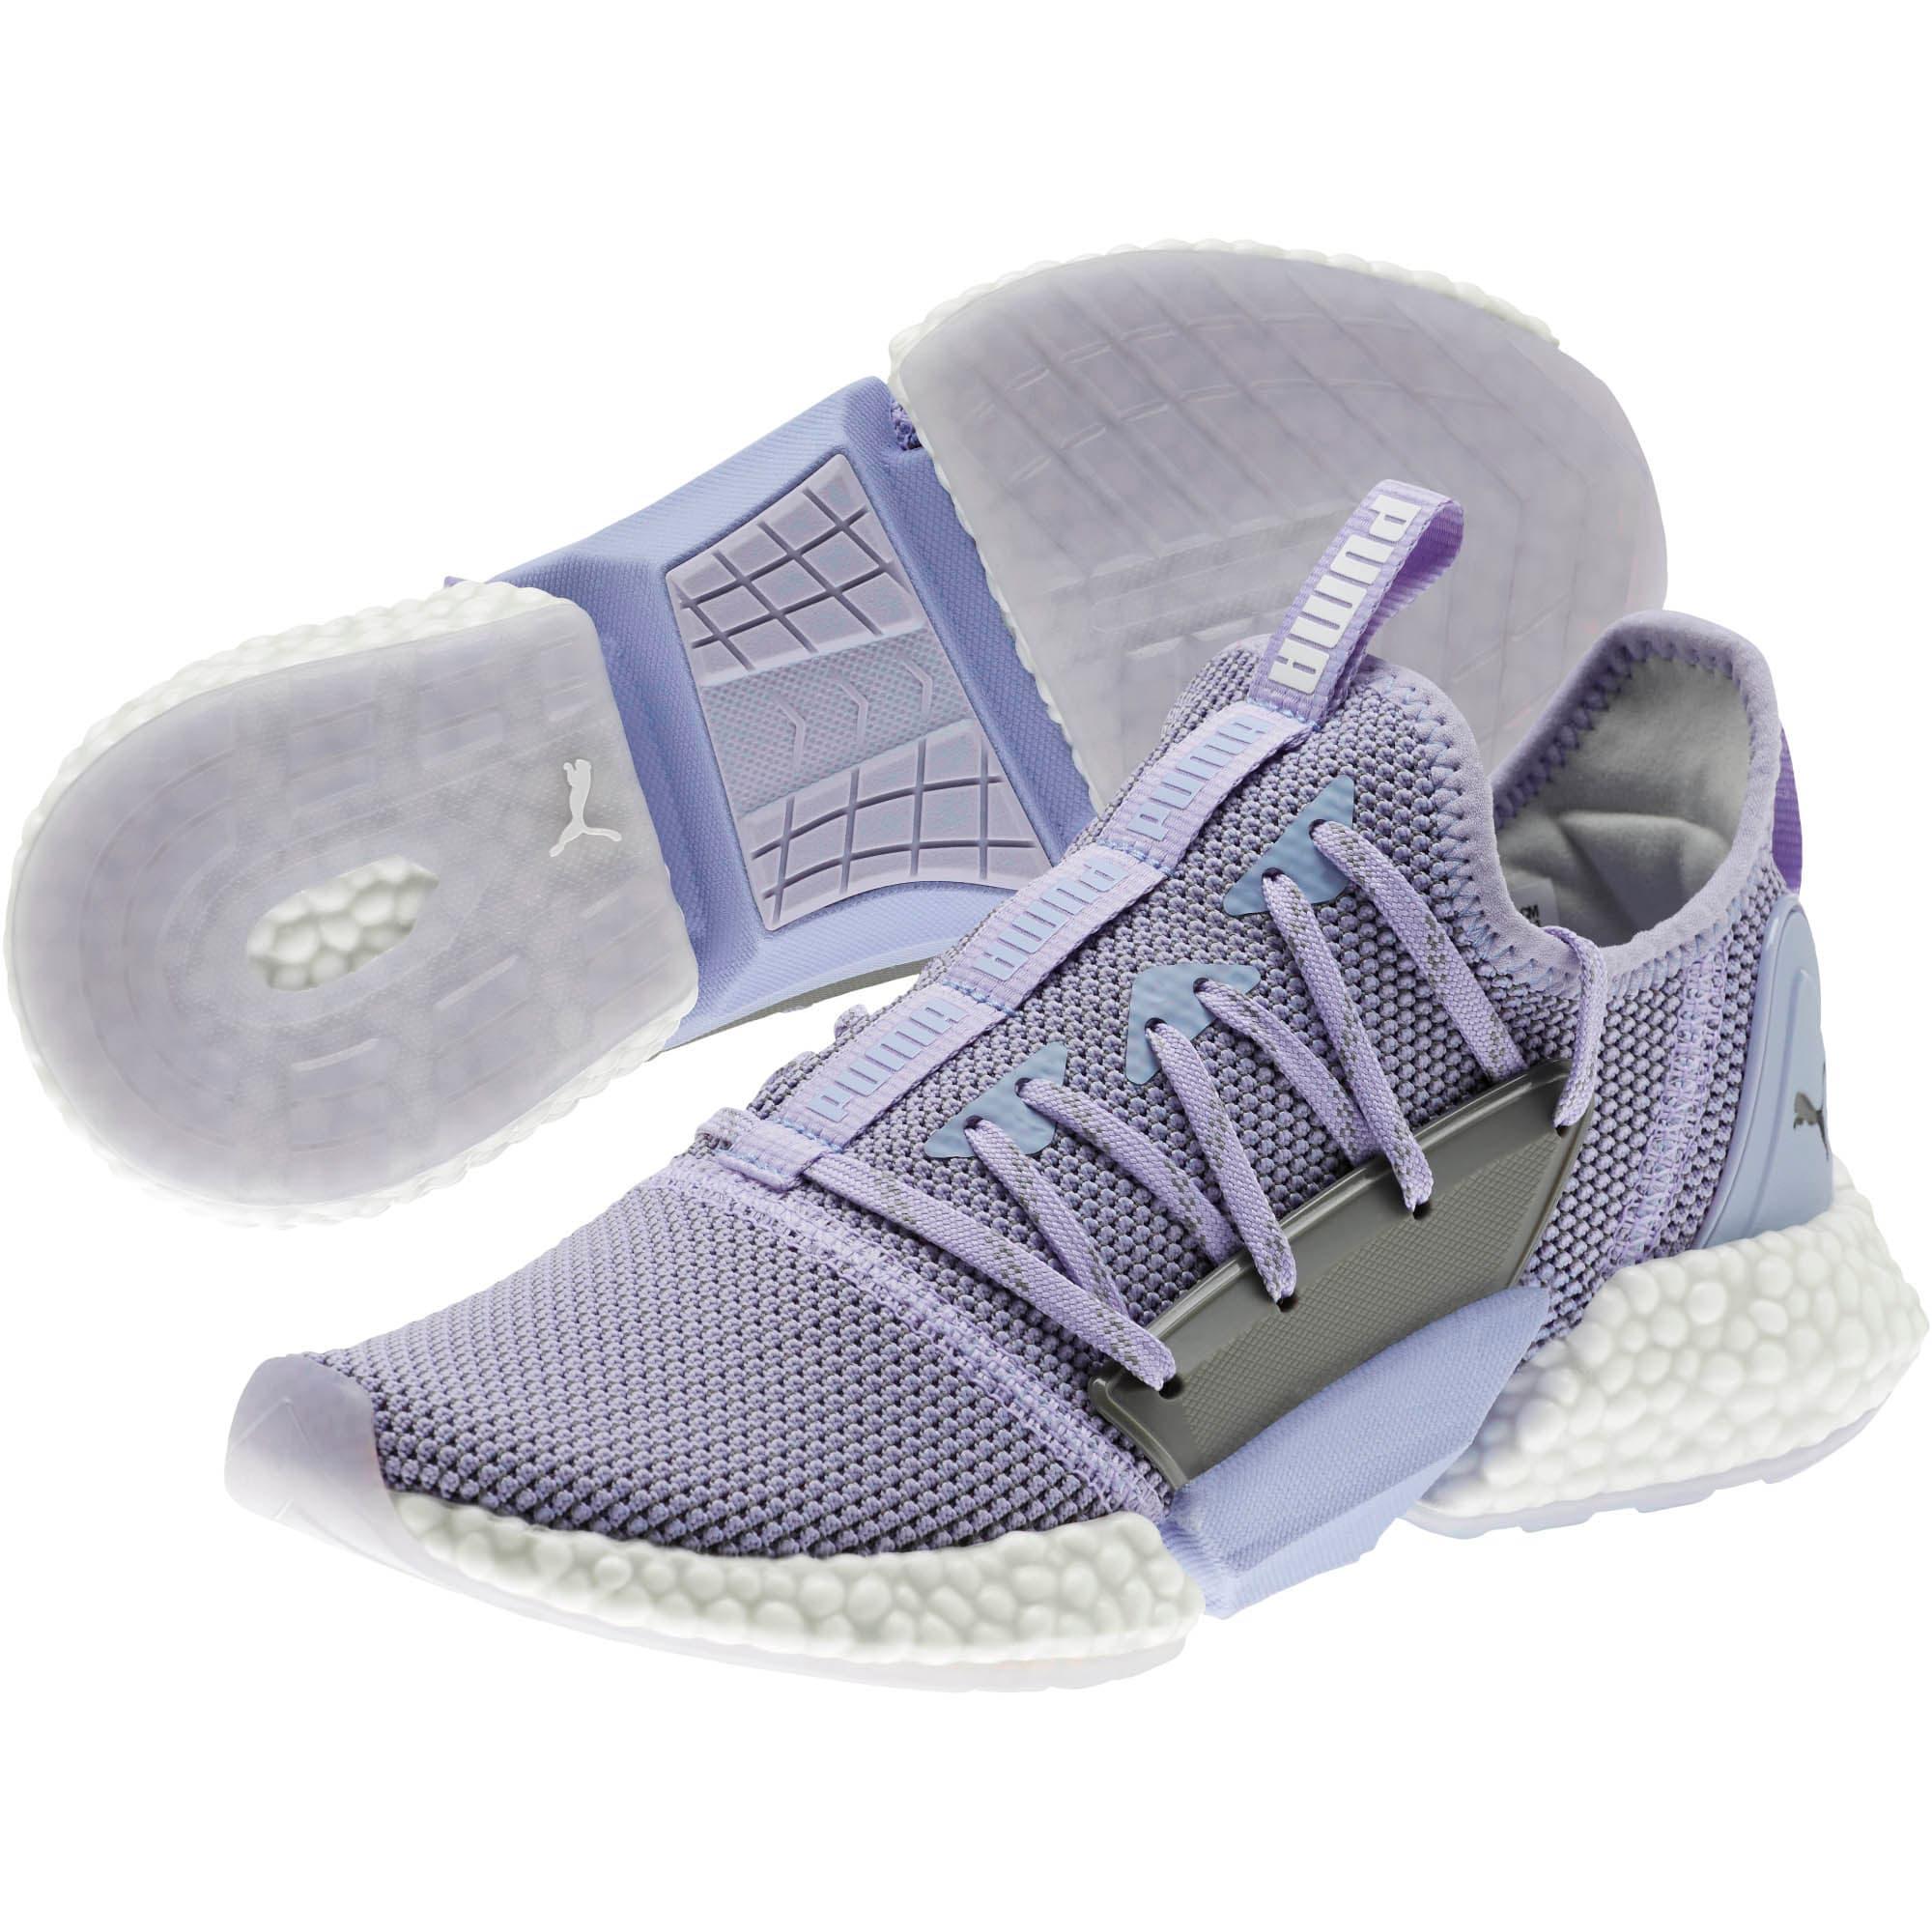 Thumbnail 2 of HYBRID Rocket Runner Women's Running Shoes, Sweet Lavender-Puma White, medium